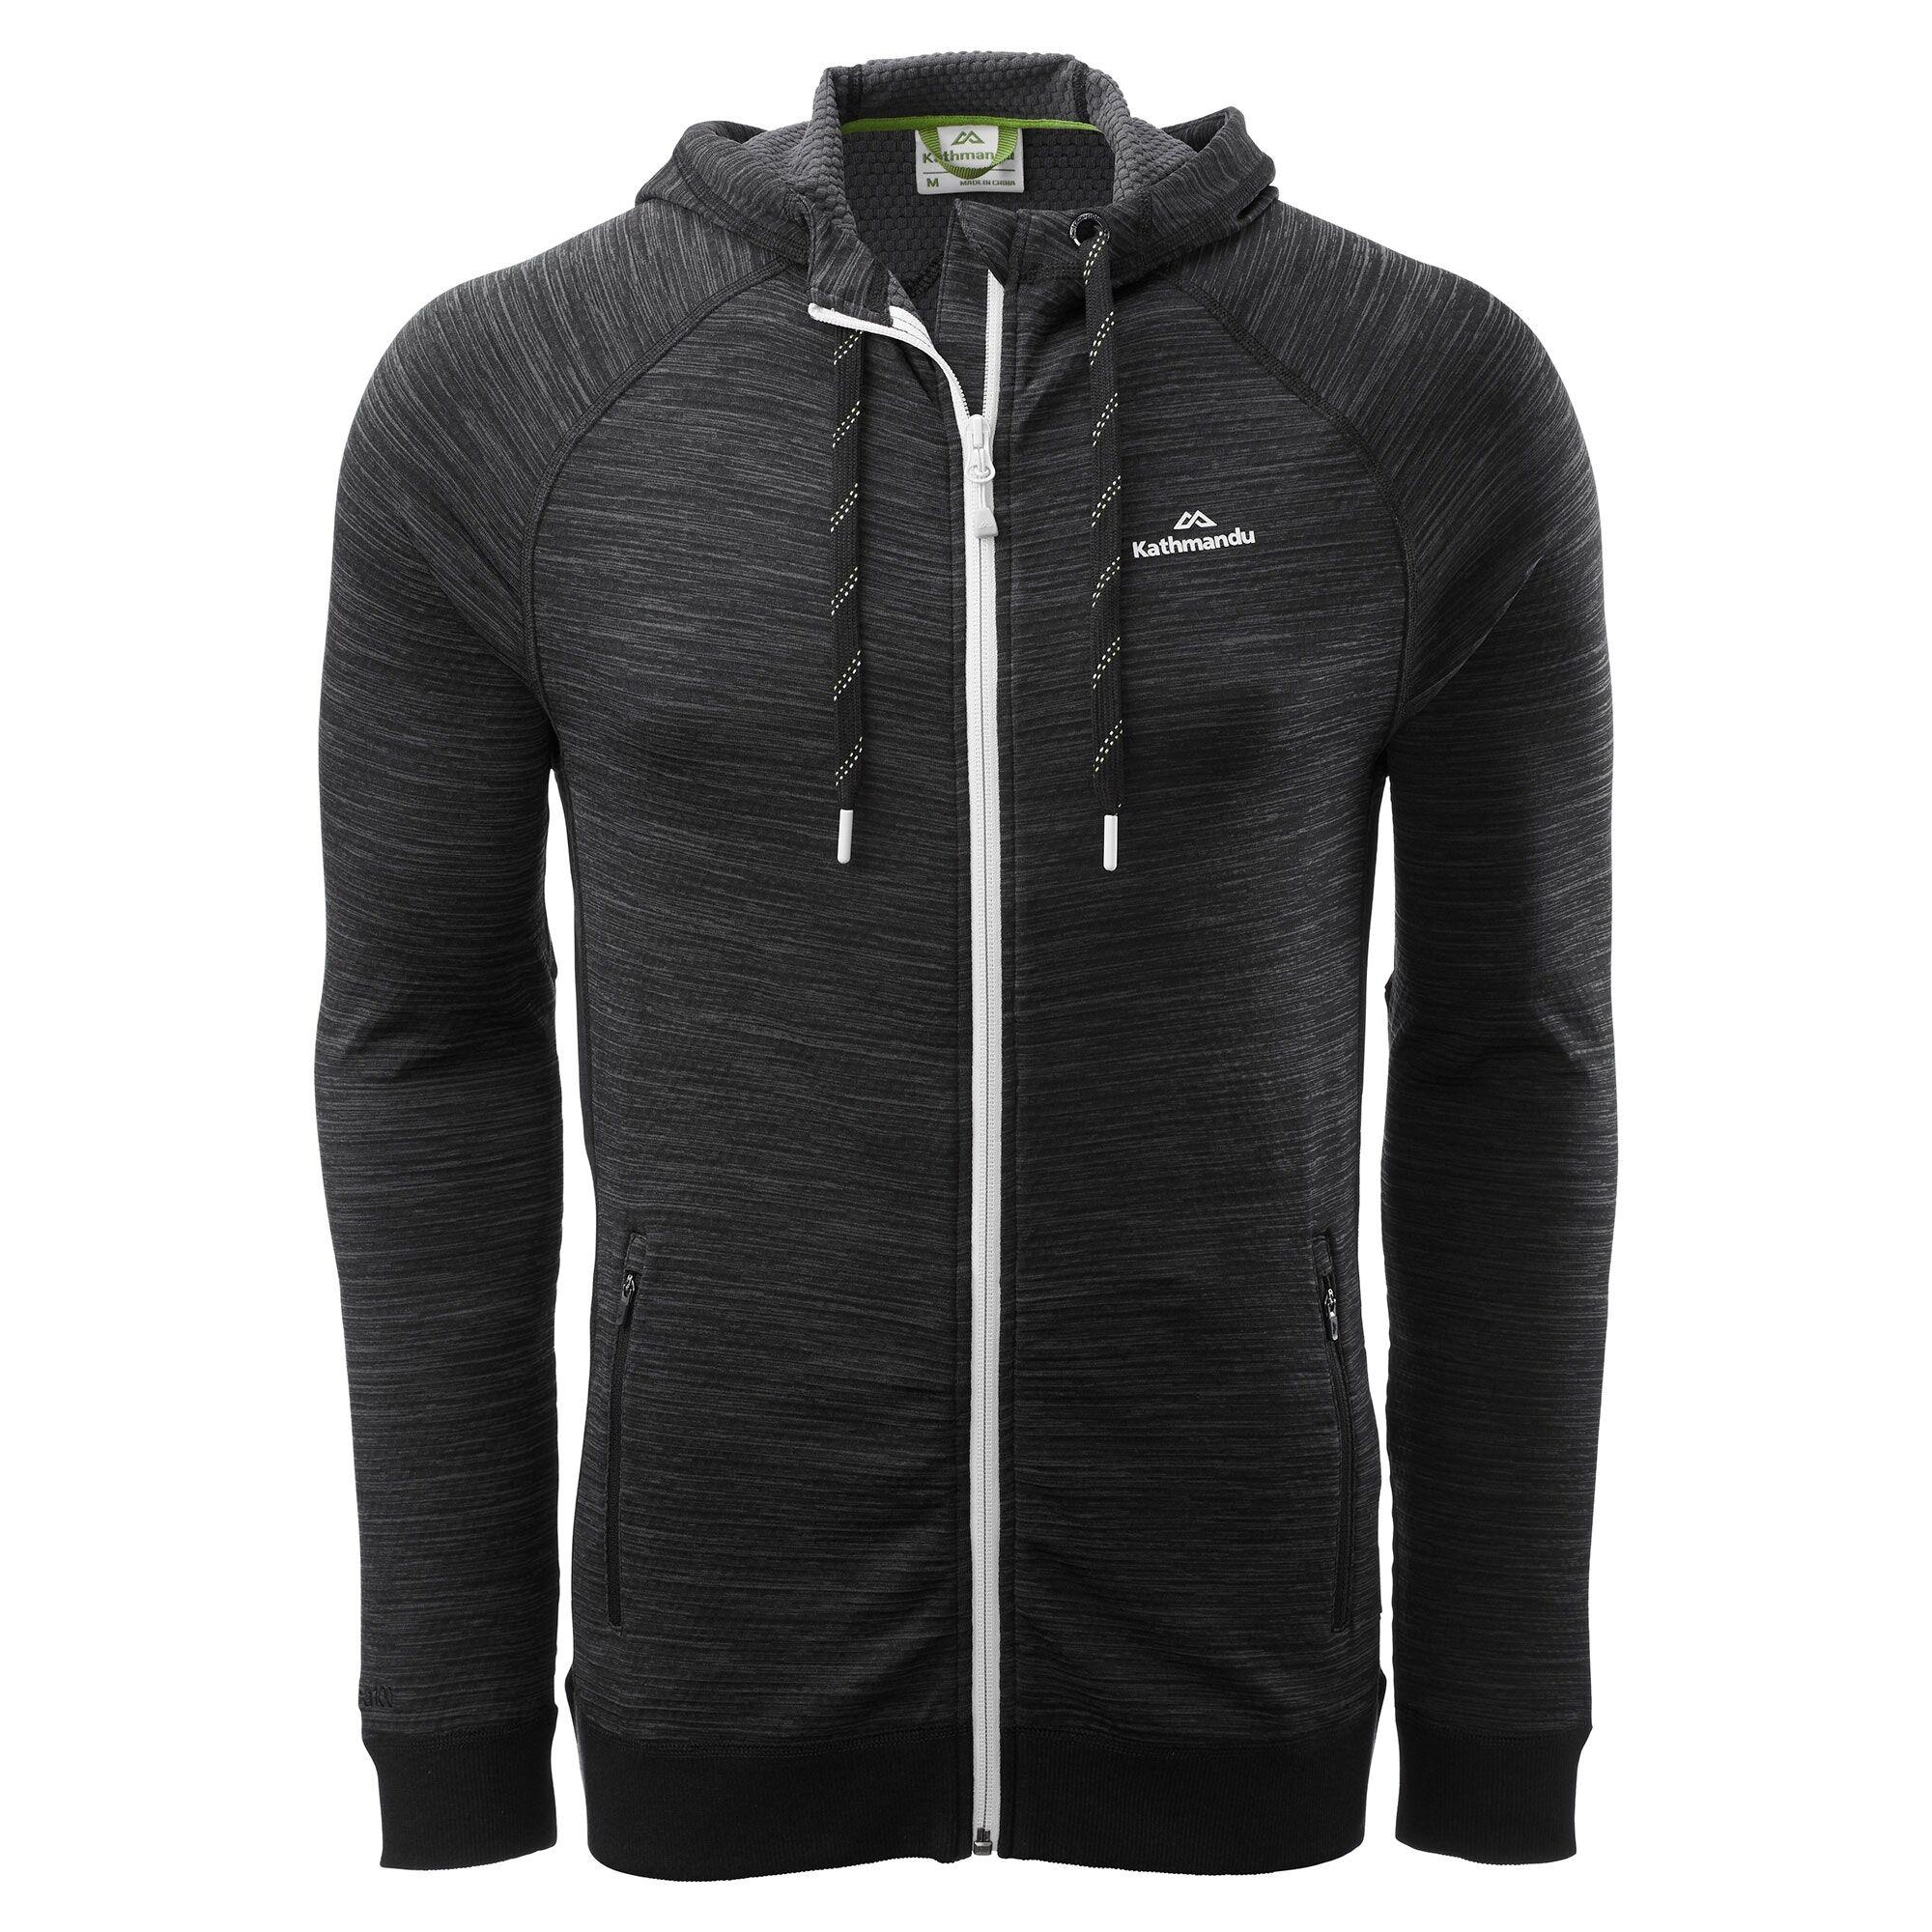 Kathmandu Acota Men's Hooded Fleece Jacket  - Granite Marle/Black - Size: Medium